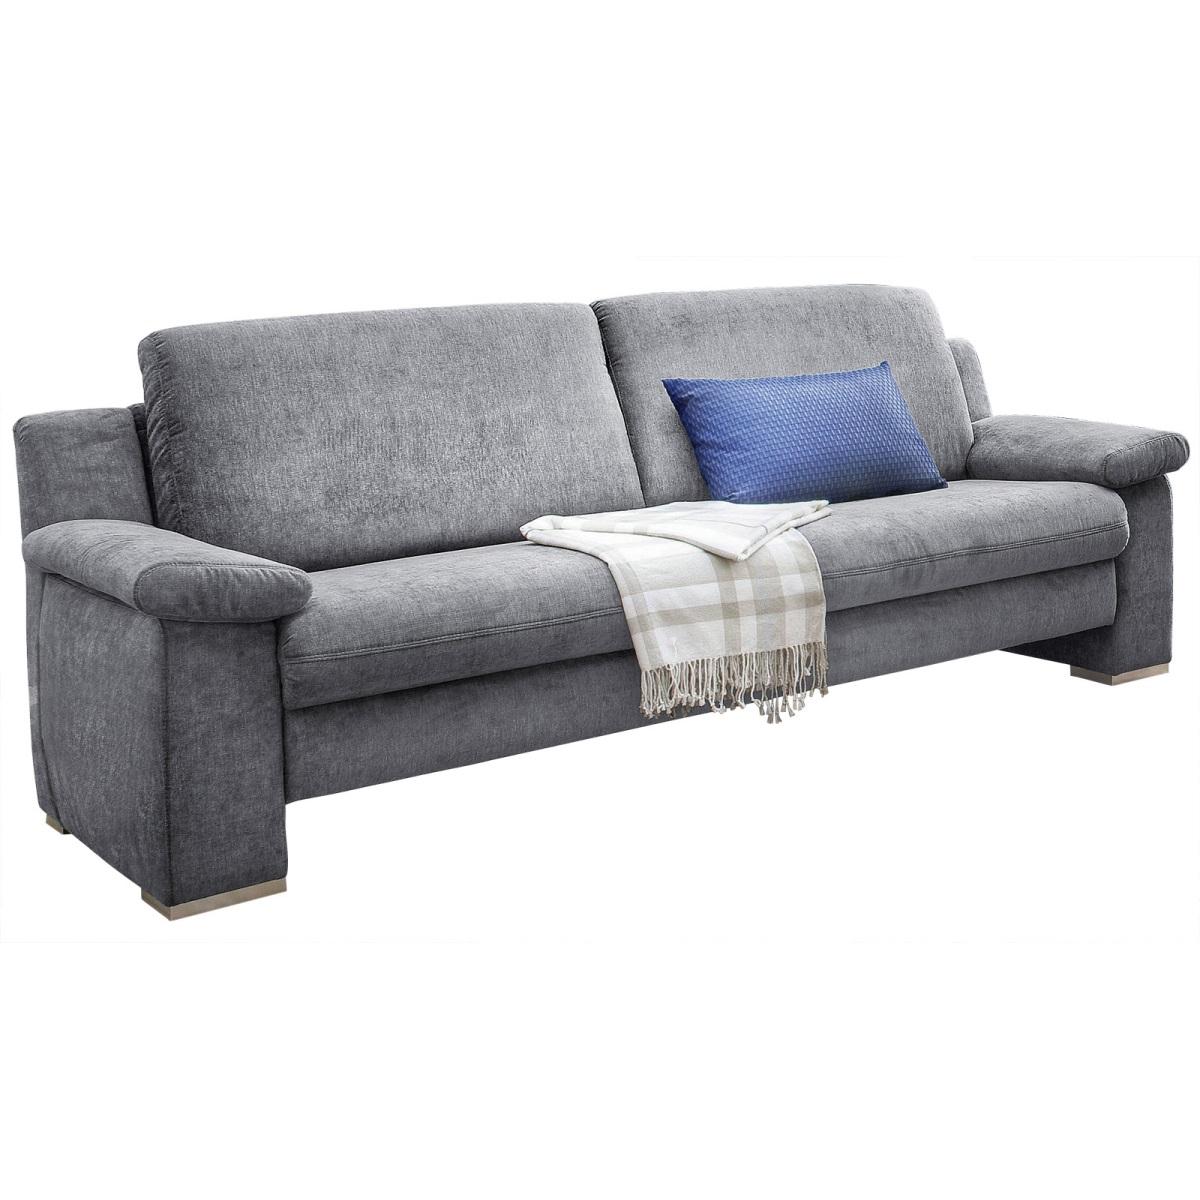 Full Size of Sofa 3 Sitzer Lascondo 222 86 Cm Livia Stoffbezug Light Grey Mit Relaxfunktion Verkaufen Chesterfield Günstig Kissen Bezug Rc3 Fenster Karup Elektrischer Sofa Sofa 3 Sitzer